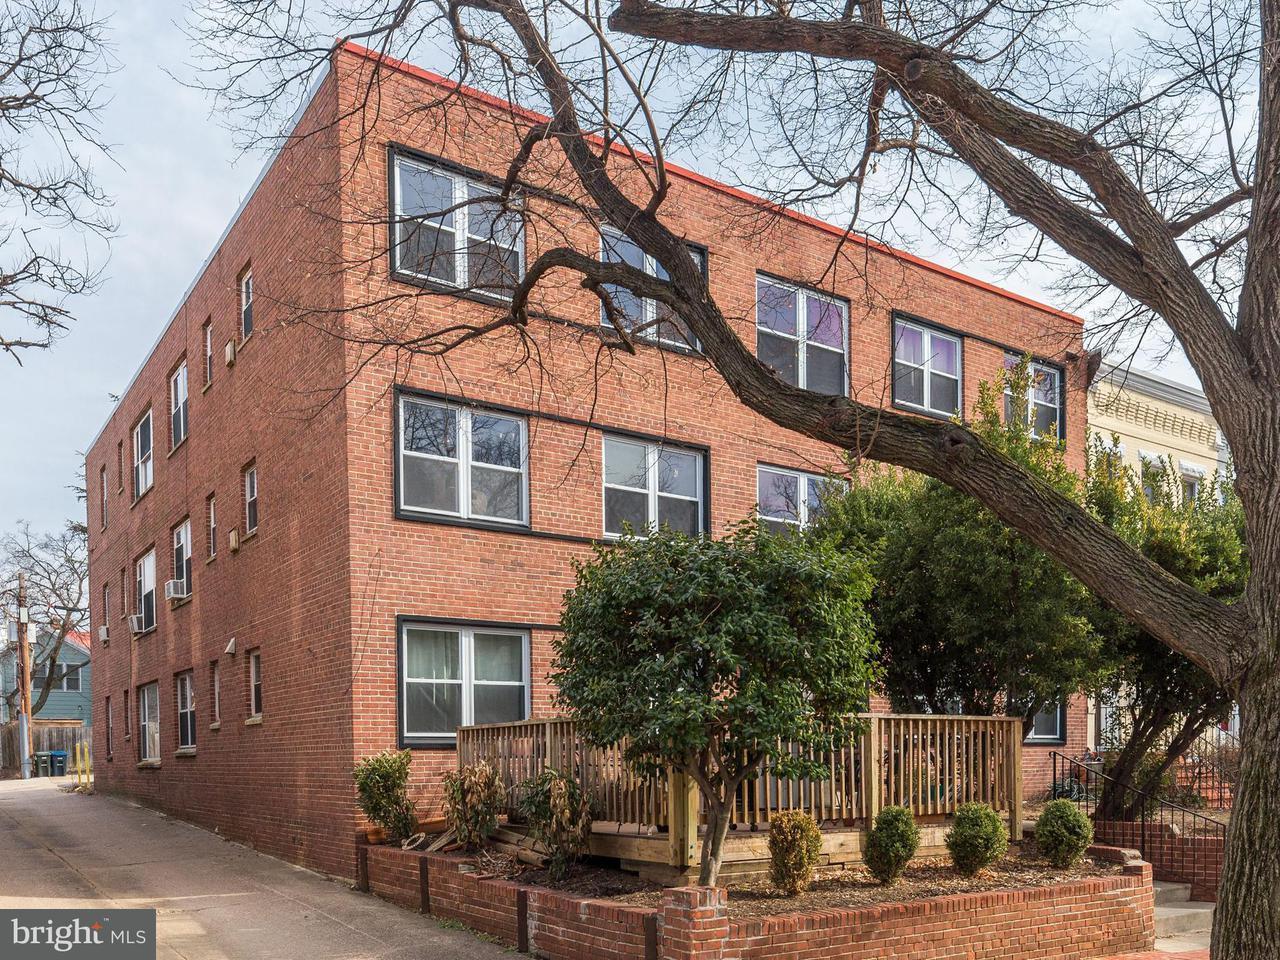 Condominium for Sale at 526 5th St SE Washington, District Of Columbia 20003 United States